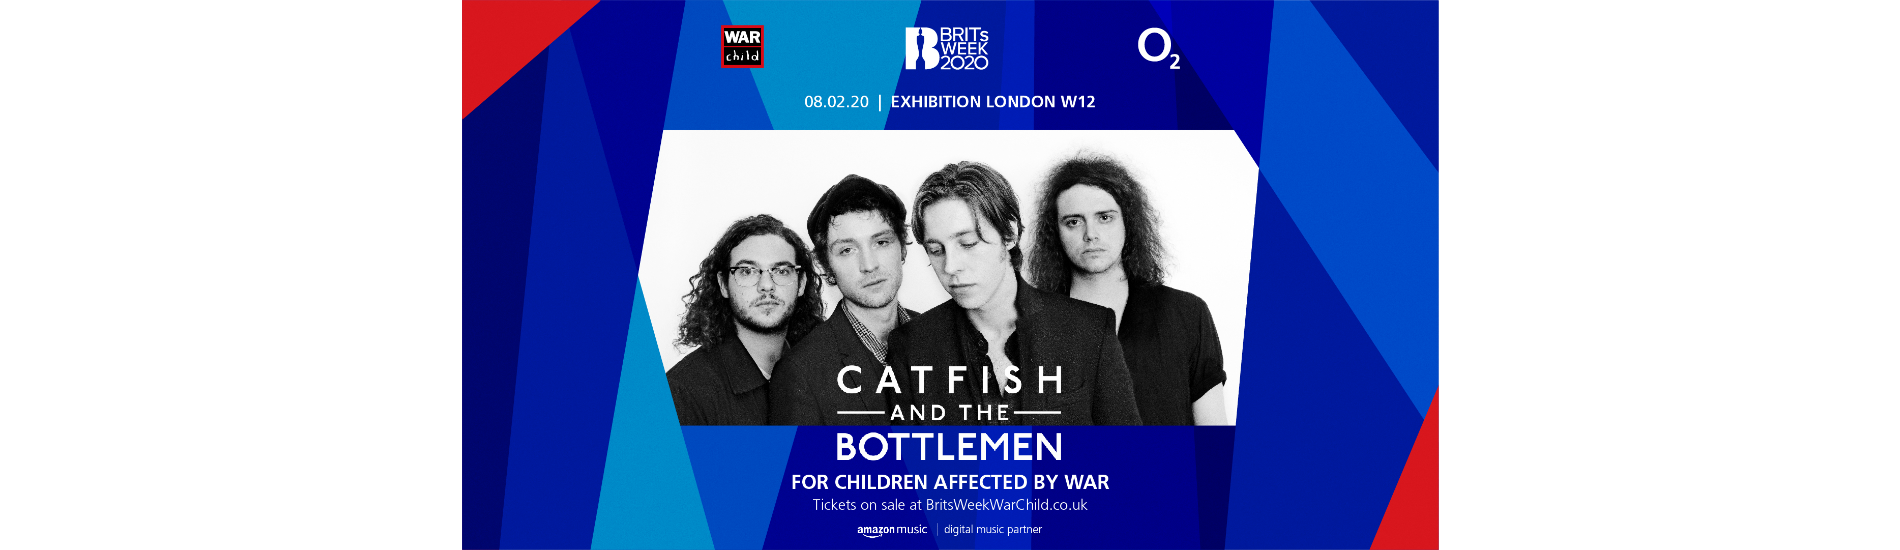 BRITs Week 2020 / Catfish and the Bottlemen